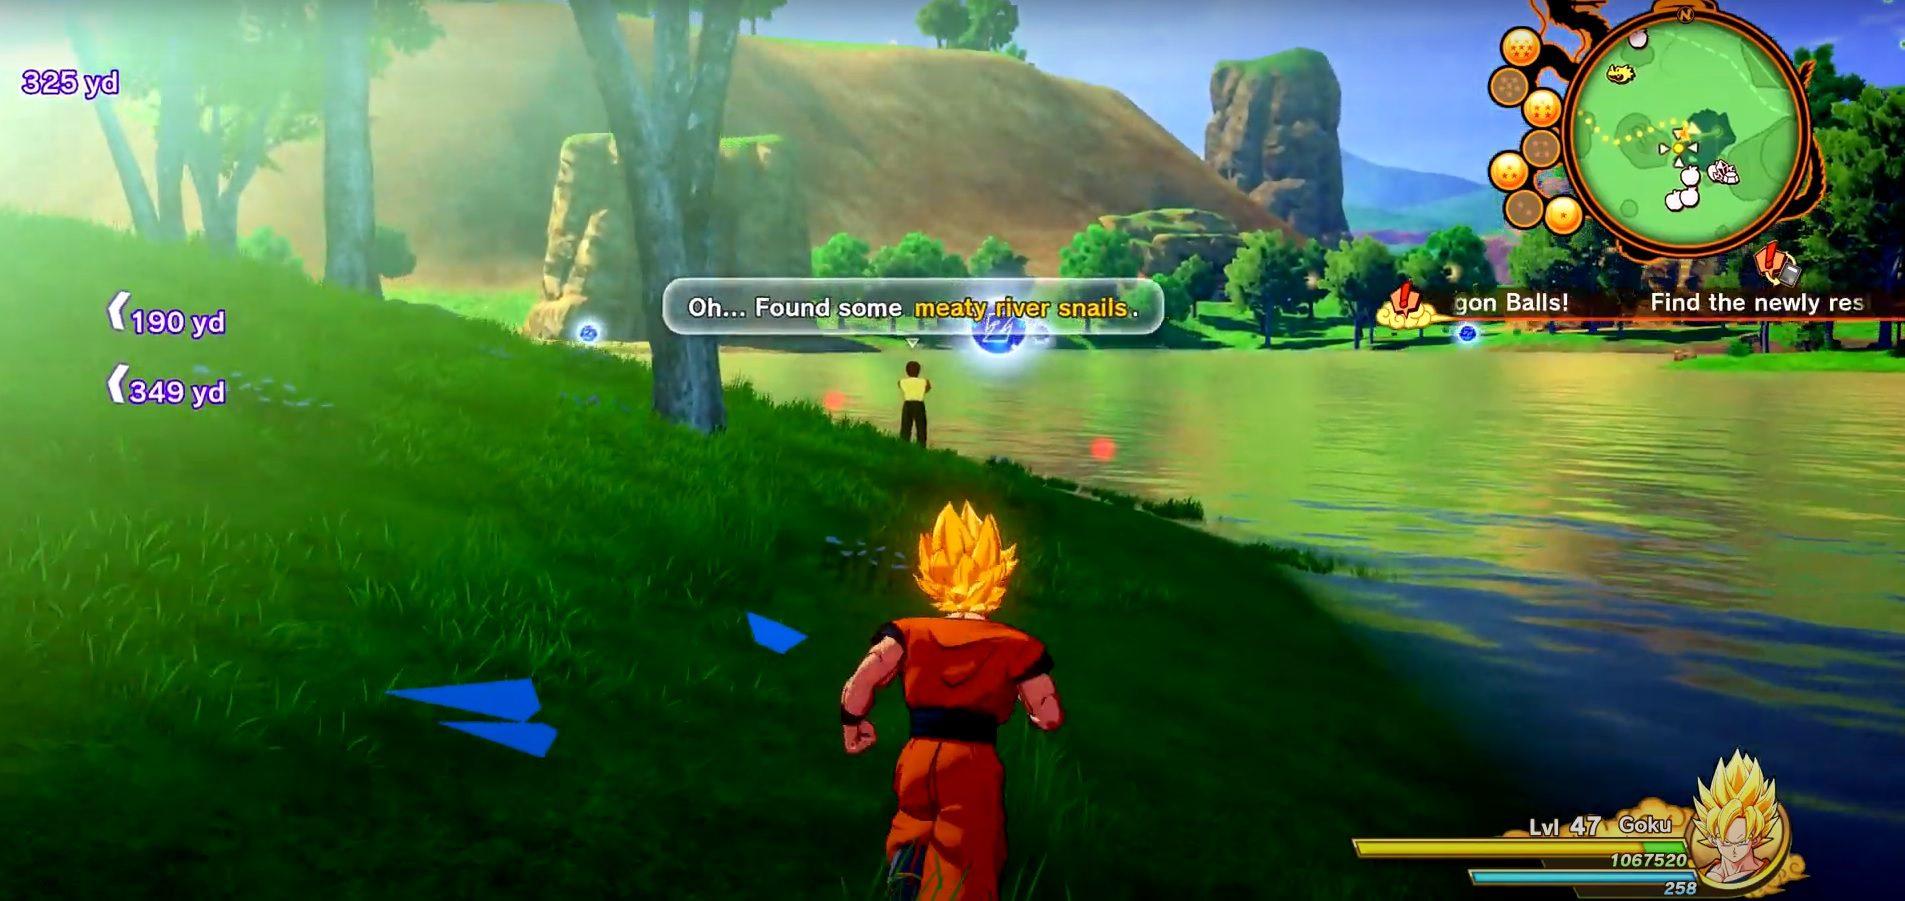 Dragon Ball Z Kakarot Meaty River Snails Locations Guide